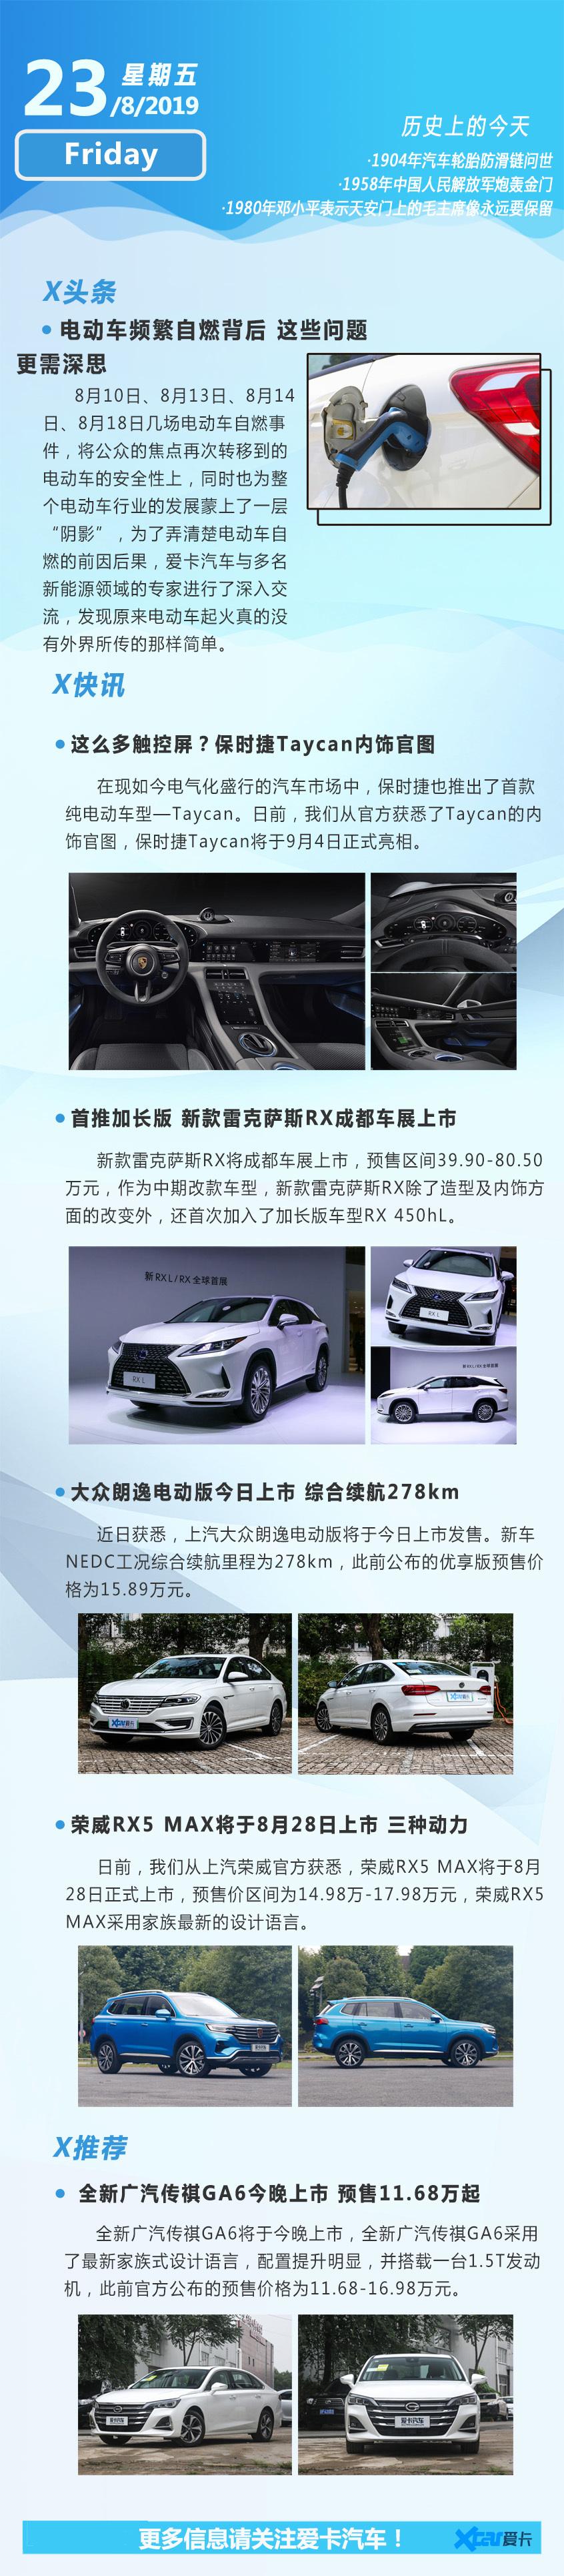 8月23日早报 全新传祺GA6保时捷Taycan